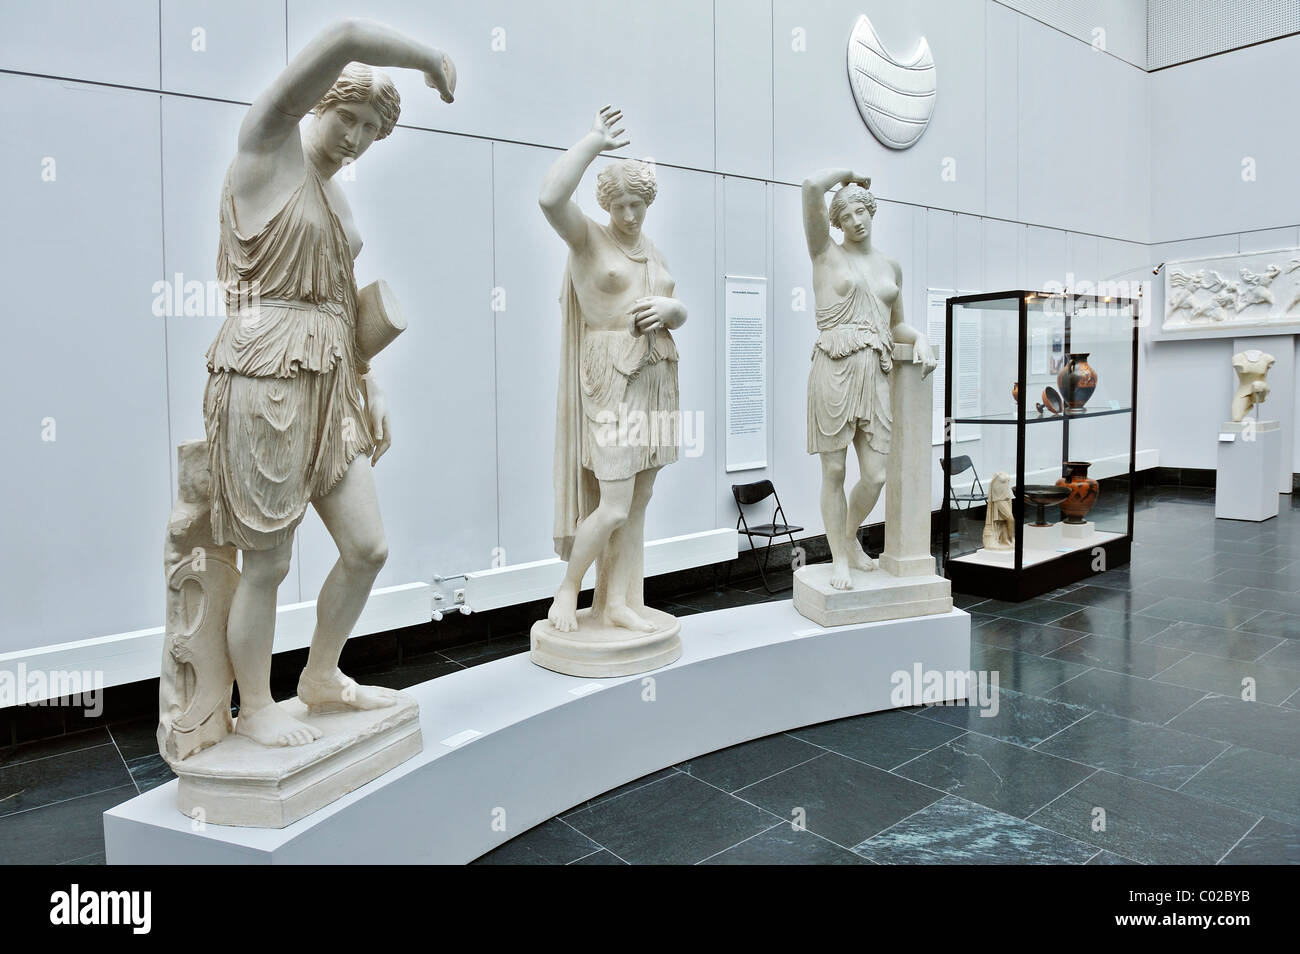 Three Amazons, Roman copies from about 440 B.C.E., Antique collection, Koenigsplatz, Munich, Bavaria, Germany, Europe - Stock Image